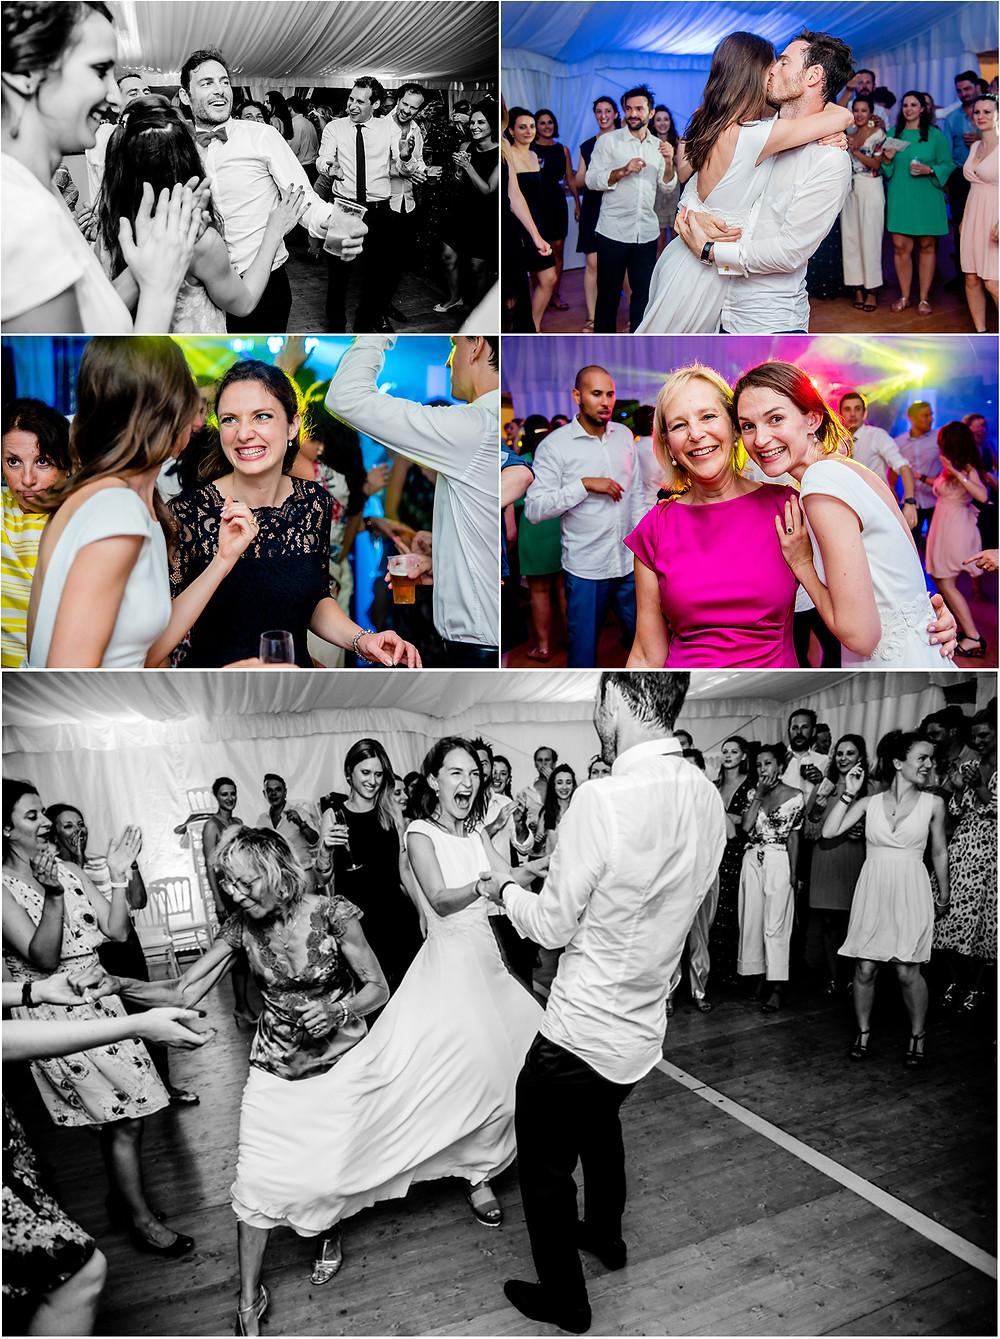 Mariage en charente - photos soirée - Brigitte Delibes Photographie - Photographe Mariage Nantes